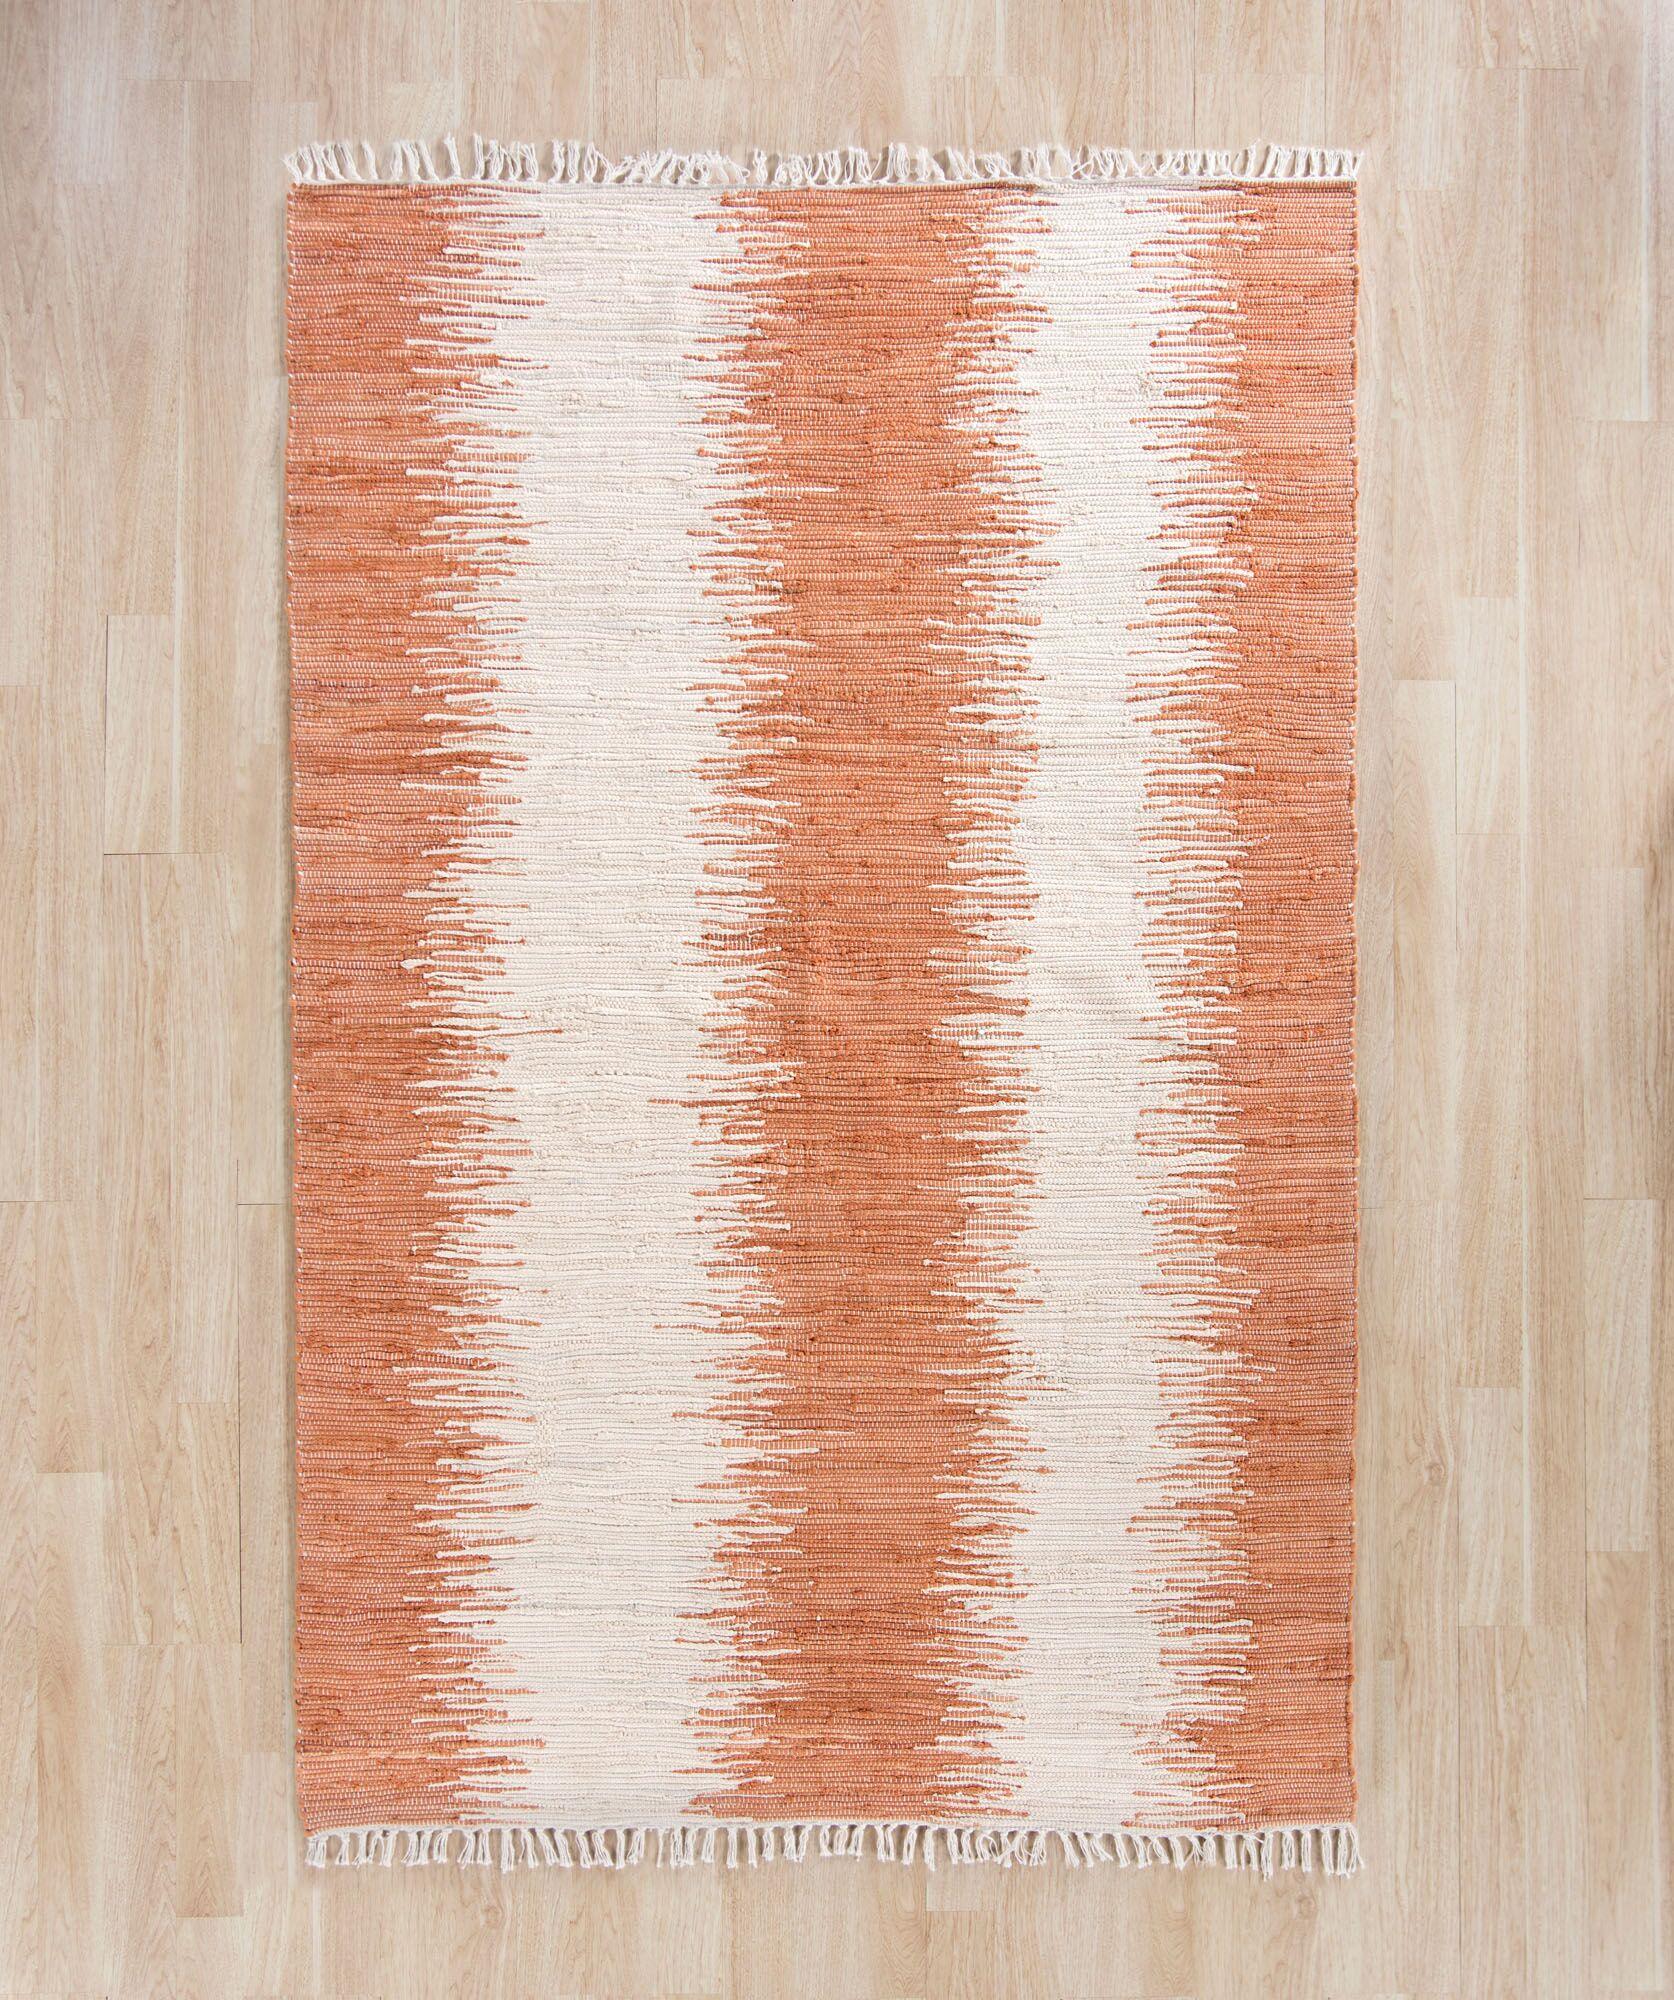 Shenandoah Hand-Woven Cotton Orange/White Area Rug Rug Size: Rectangle 8' x 10'